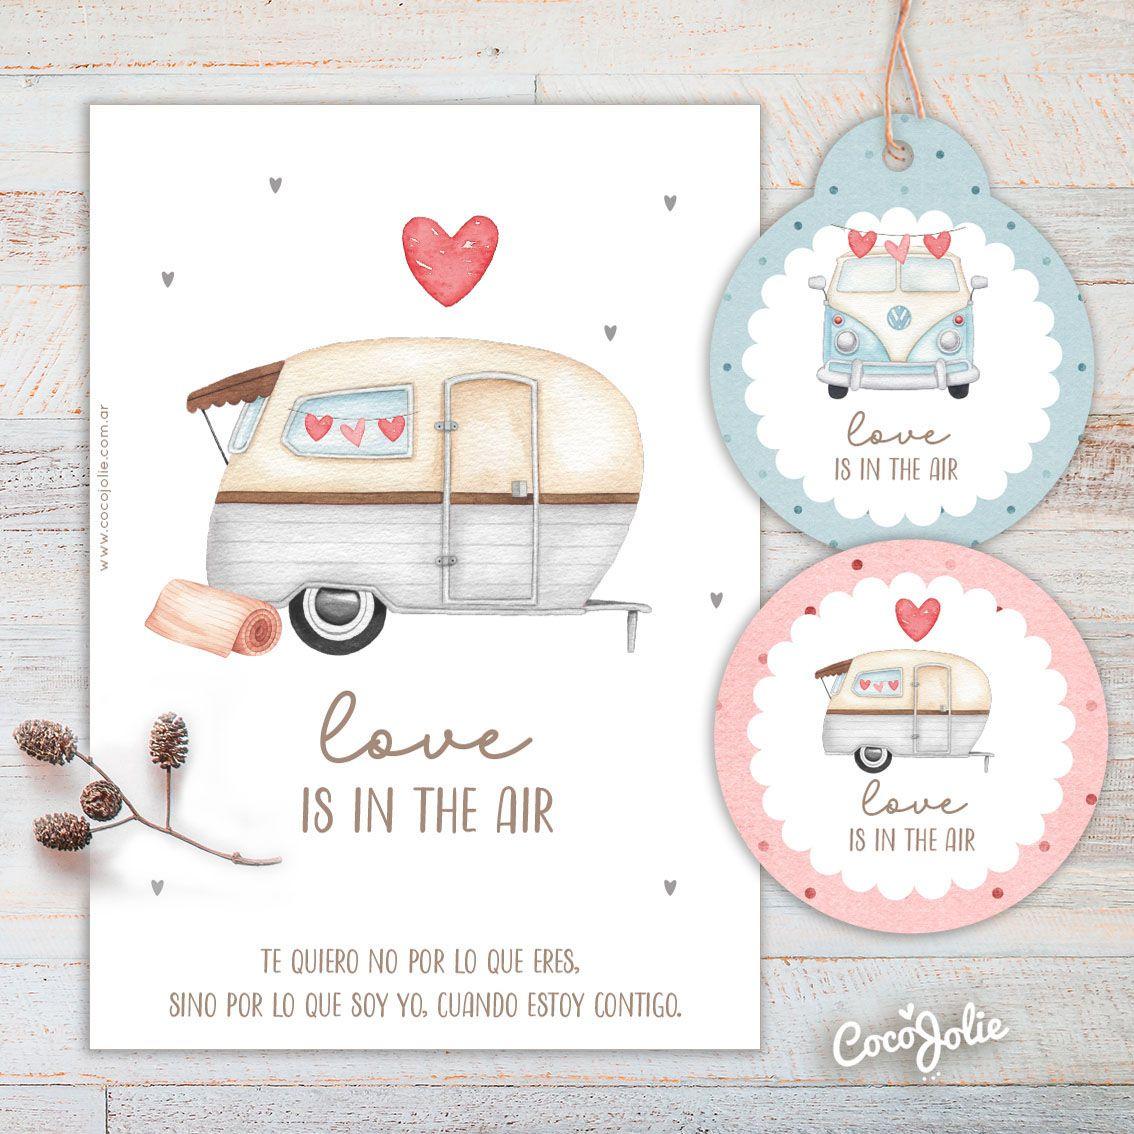 Kit Caravana San Valentin En 2021 Kit Imprimible Imprimible Dia De Los Enamorados